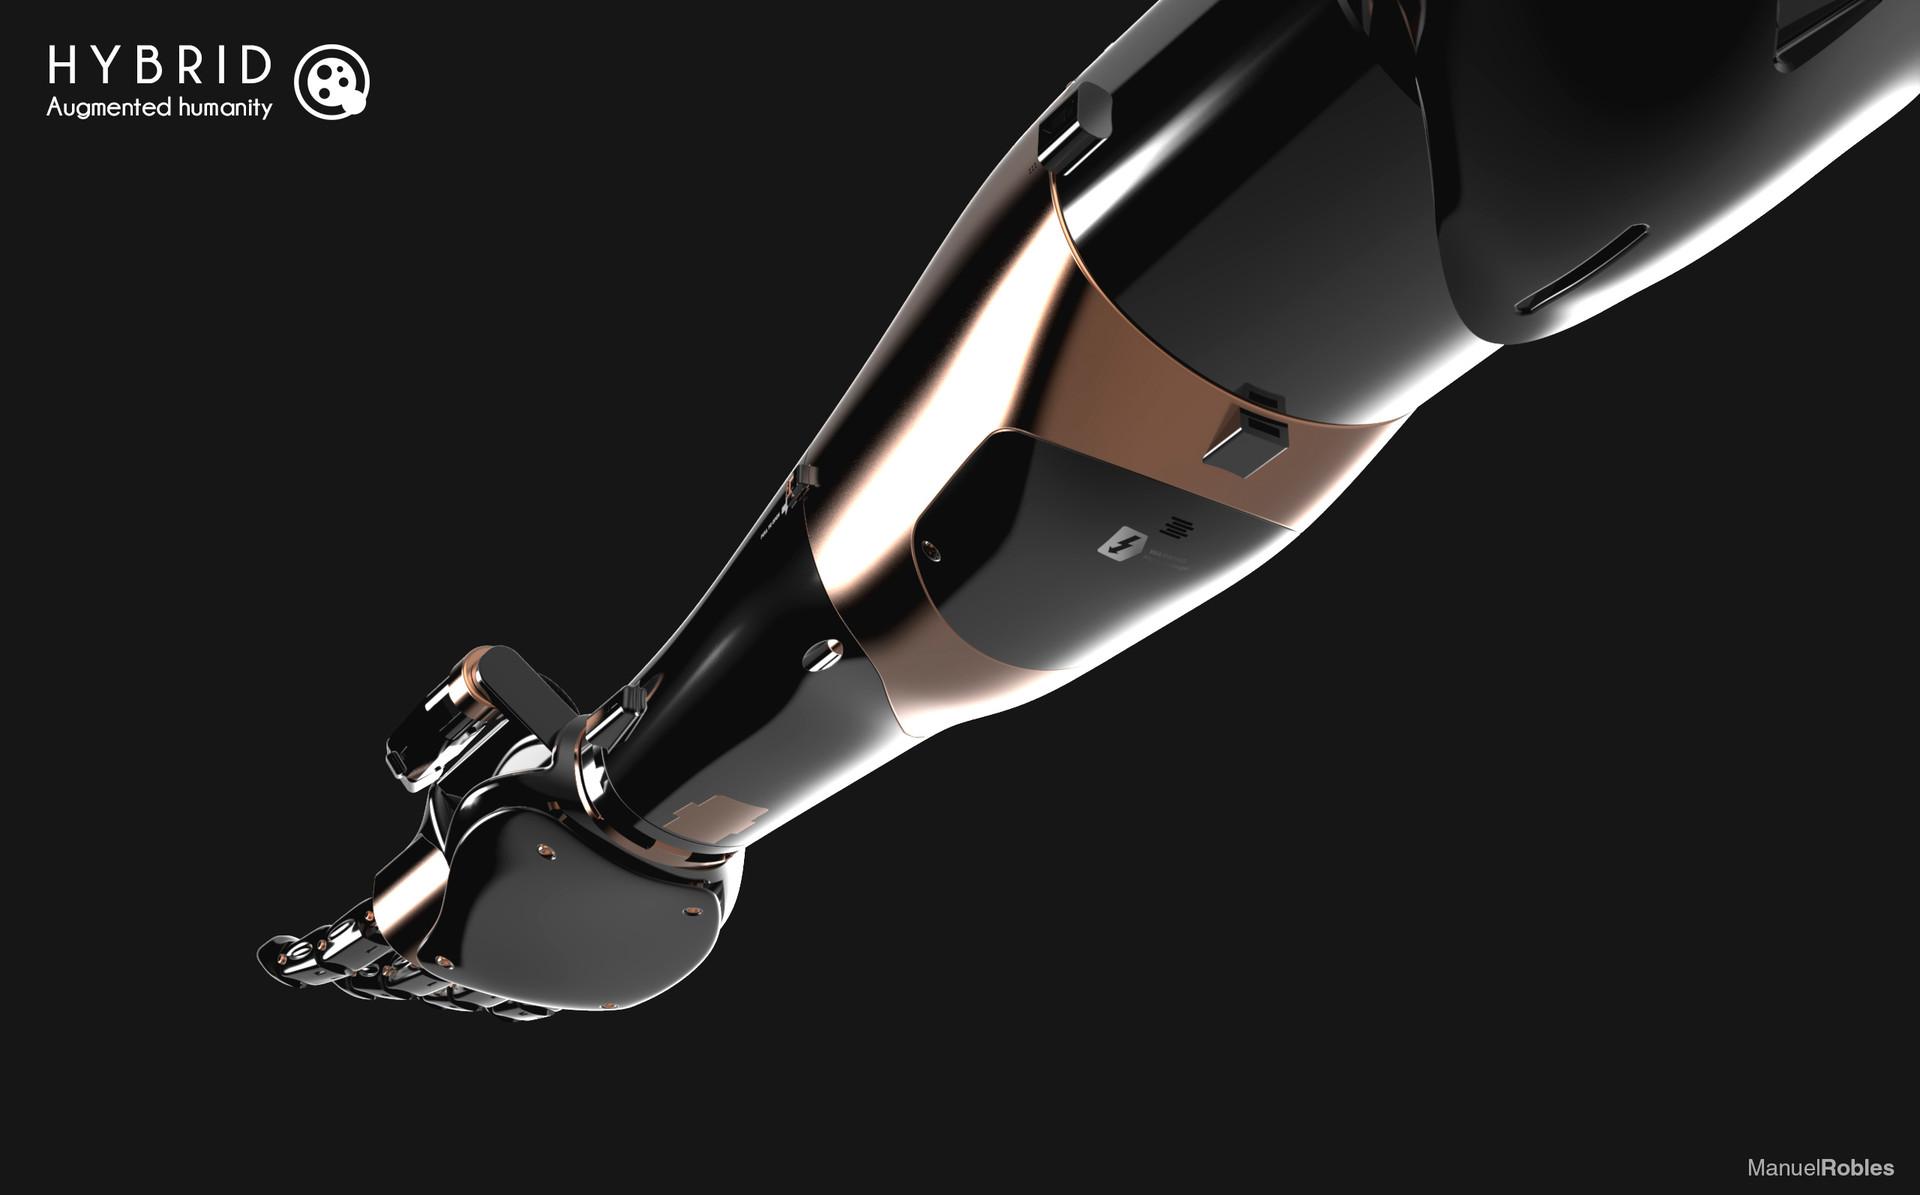 Manuel robles robot arm keyshot 12